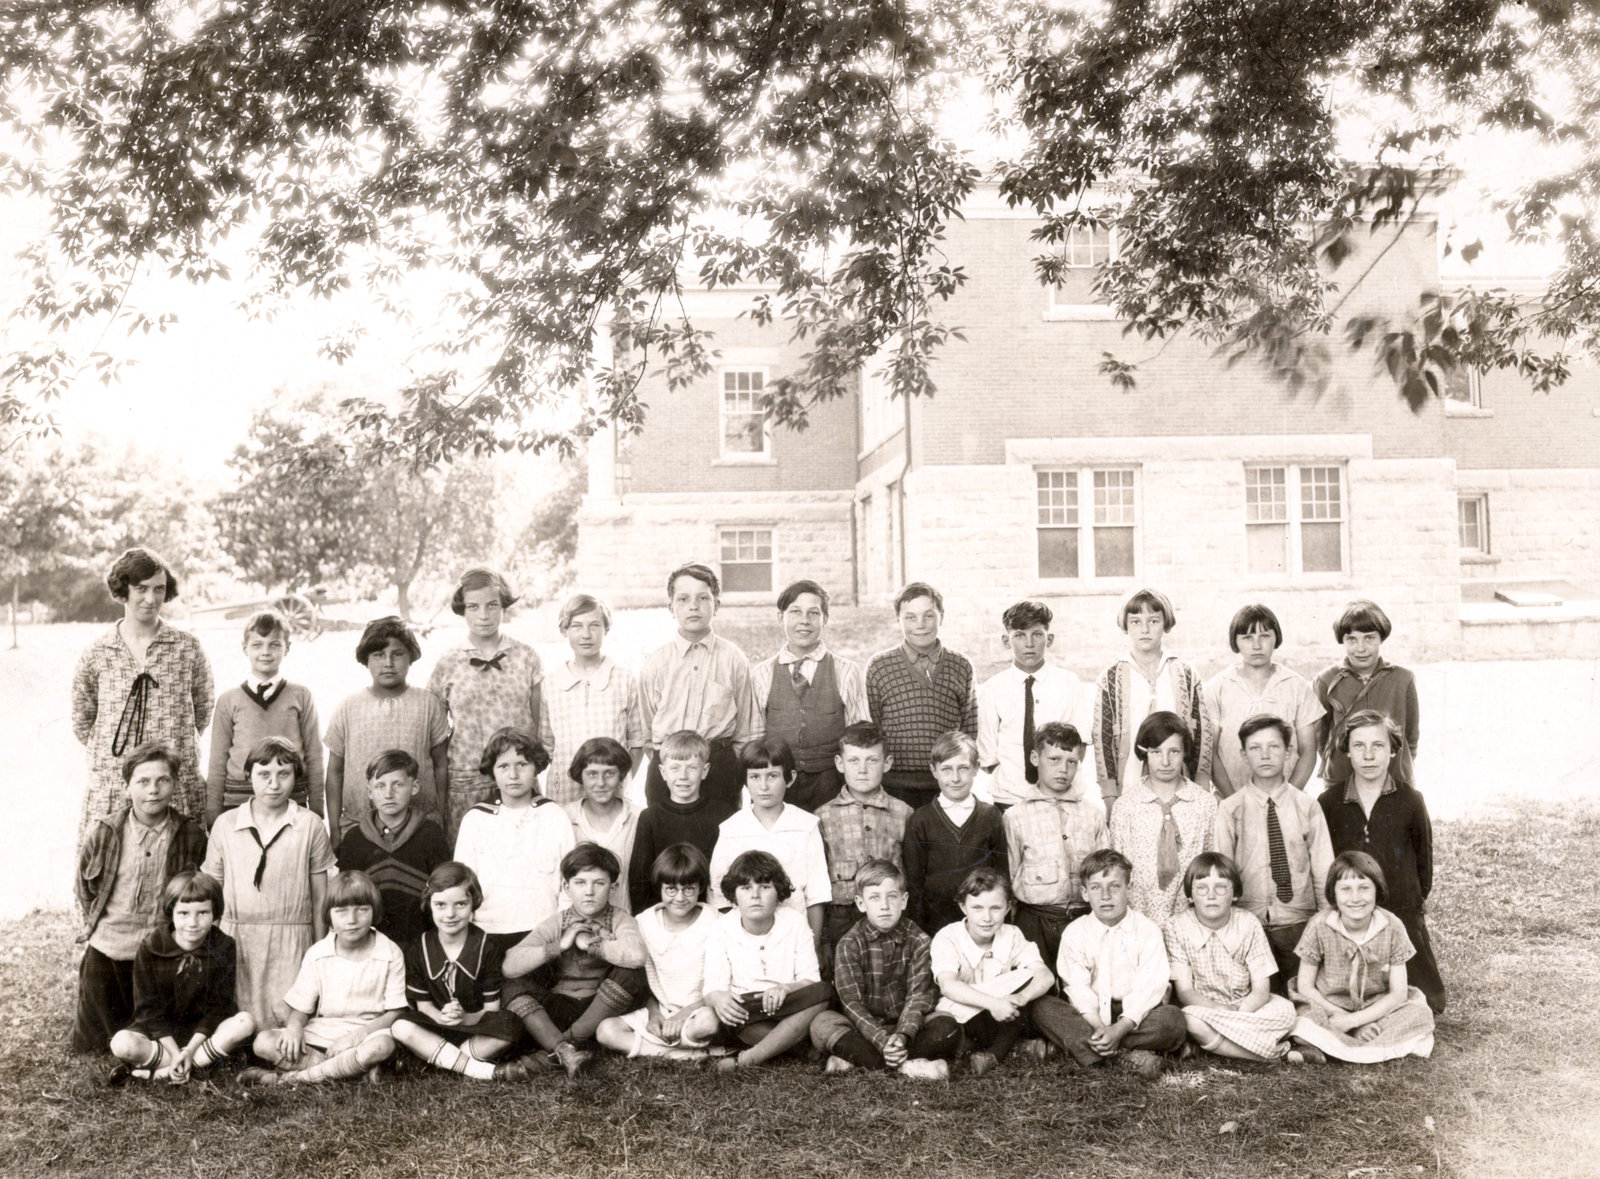 Laura Secord Memorial School in Queenston, class photo, 1926-27